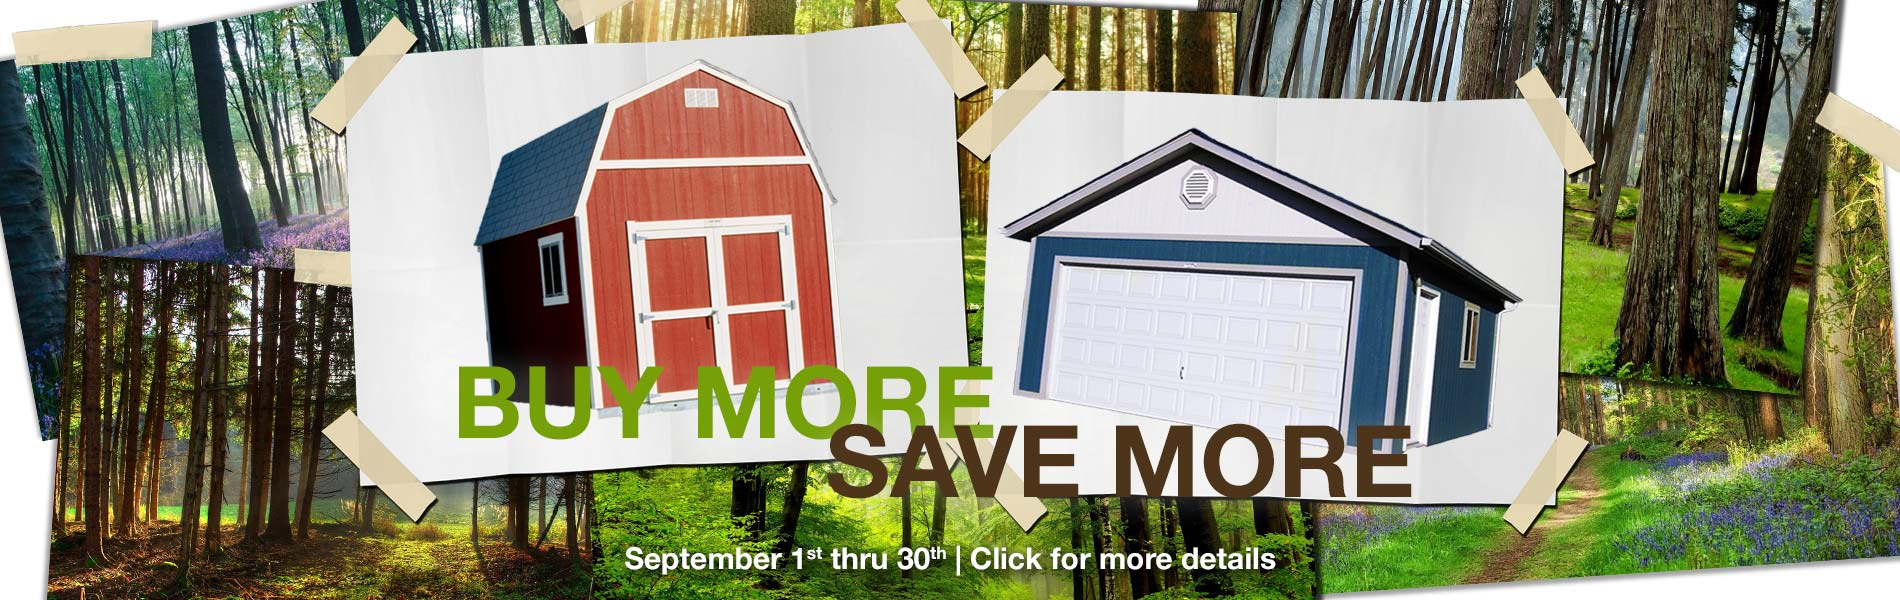 Sept-2016-Retail-Promo-Banner